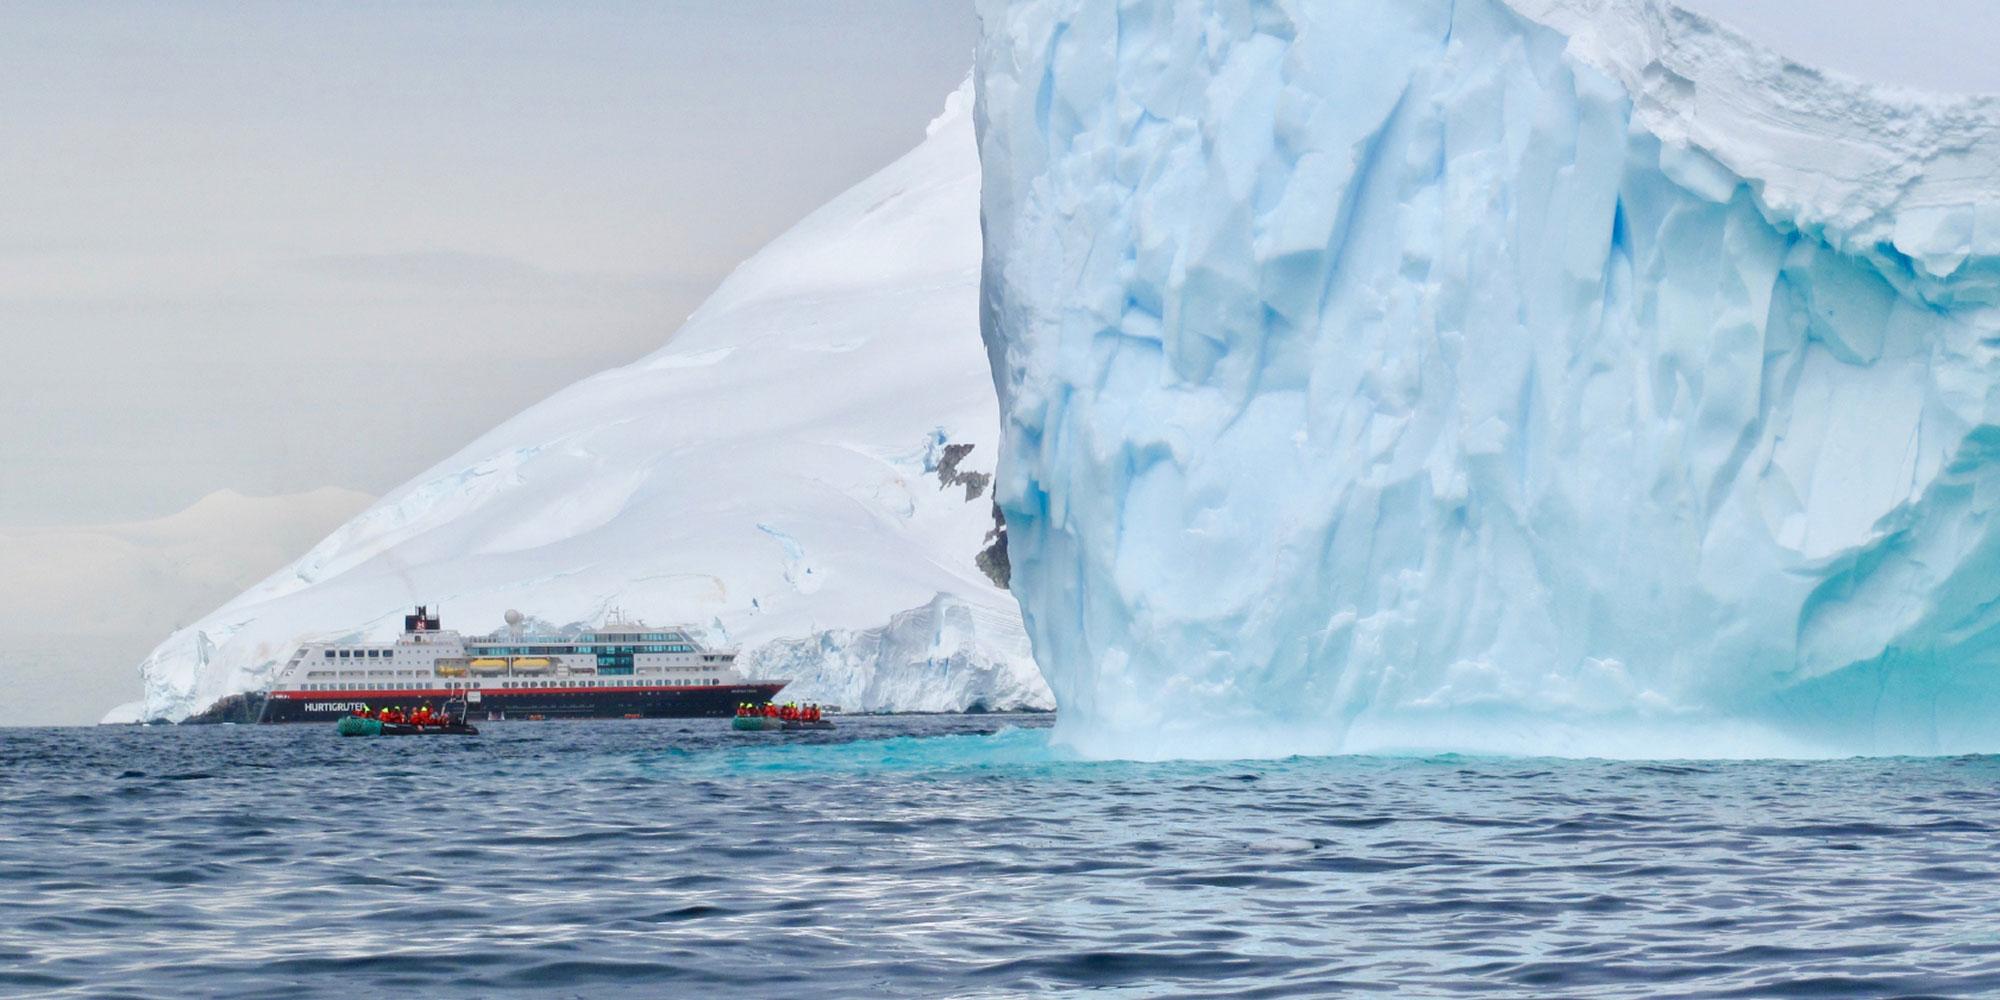 Calder and Lawson Tours - Antarctica